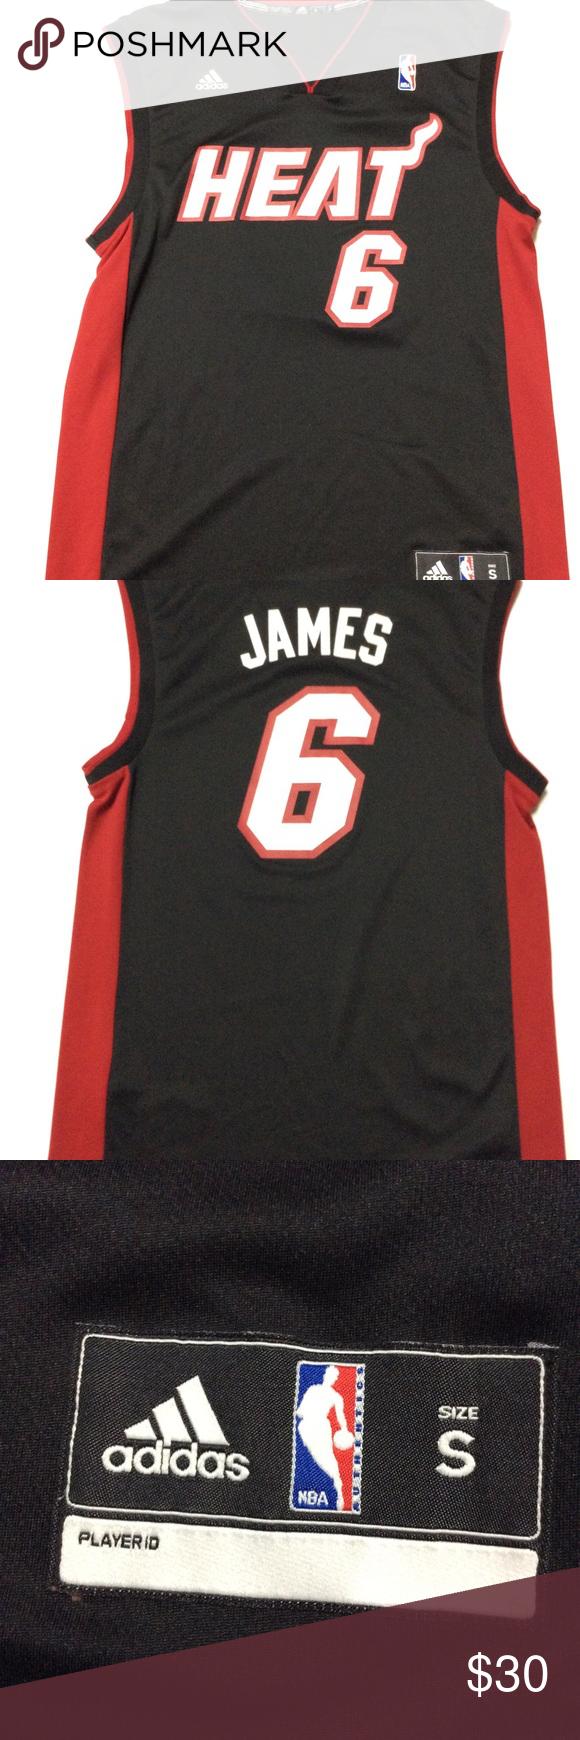 online retailer 7824a 91beb Adidas NBA Miami Heat Jersey small #6 Lebron James black ...